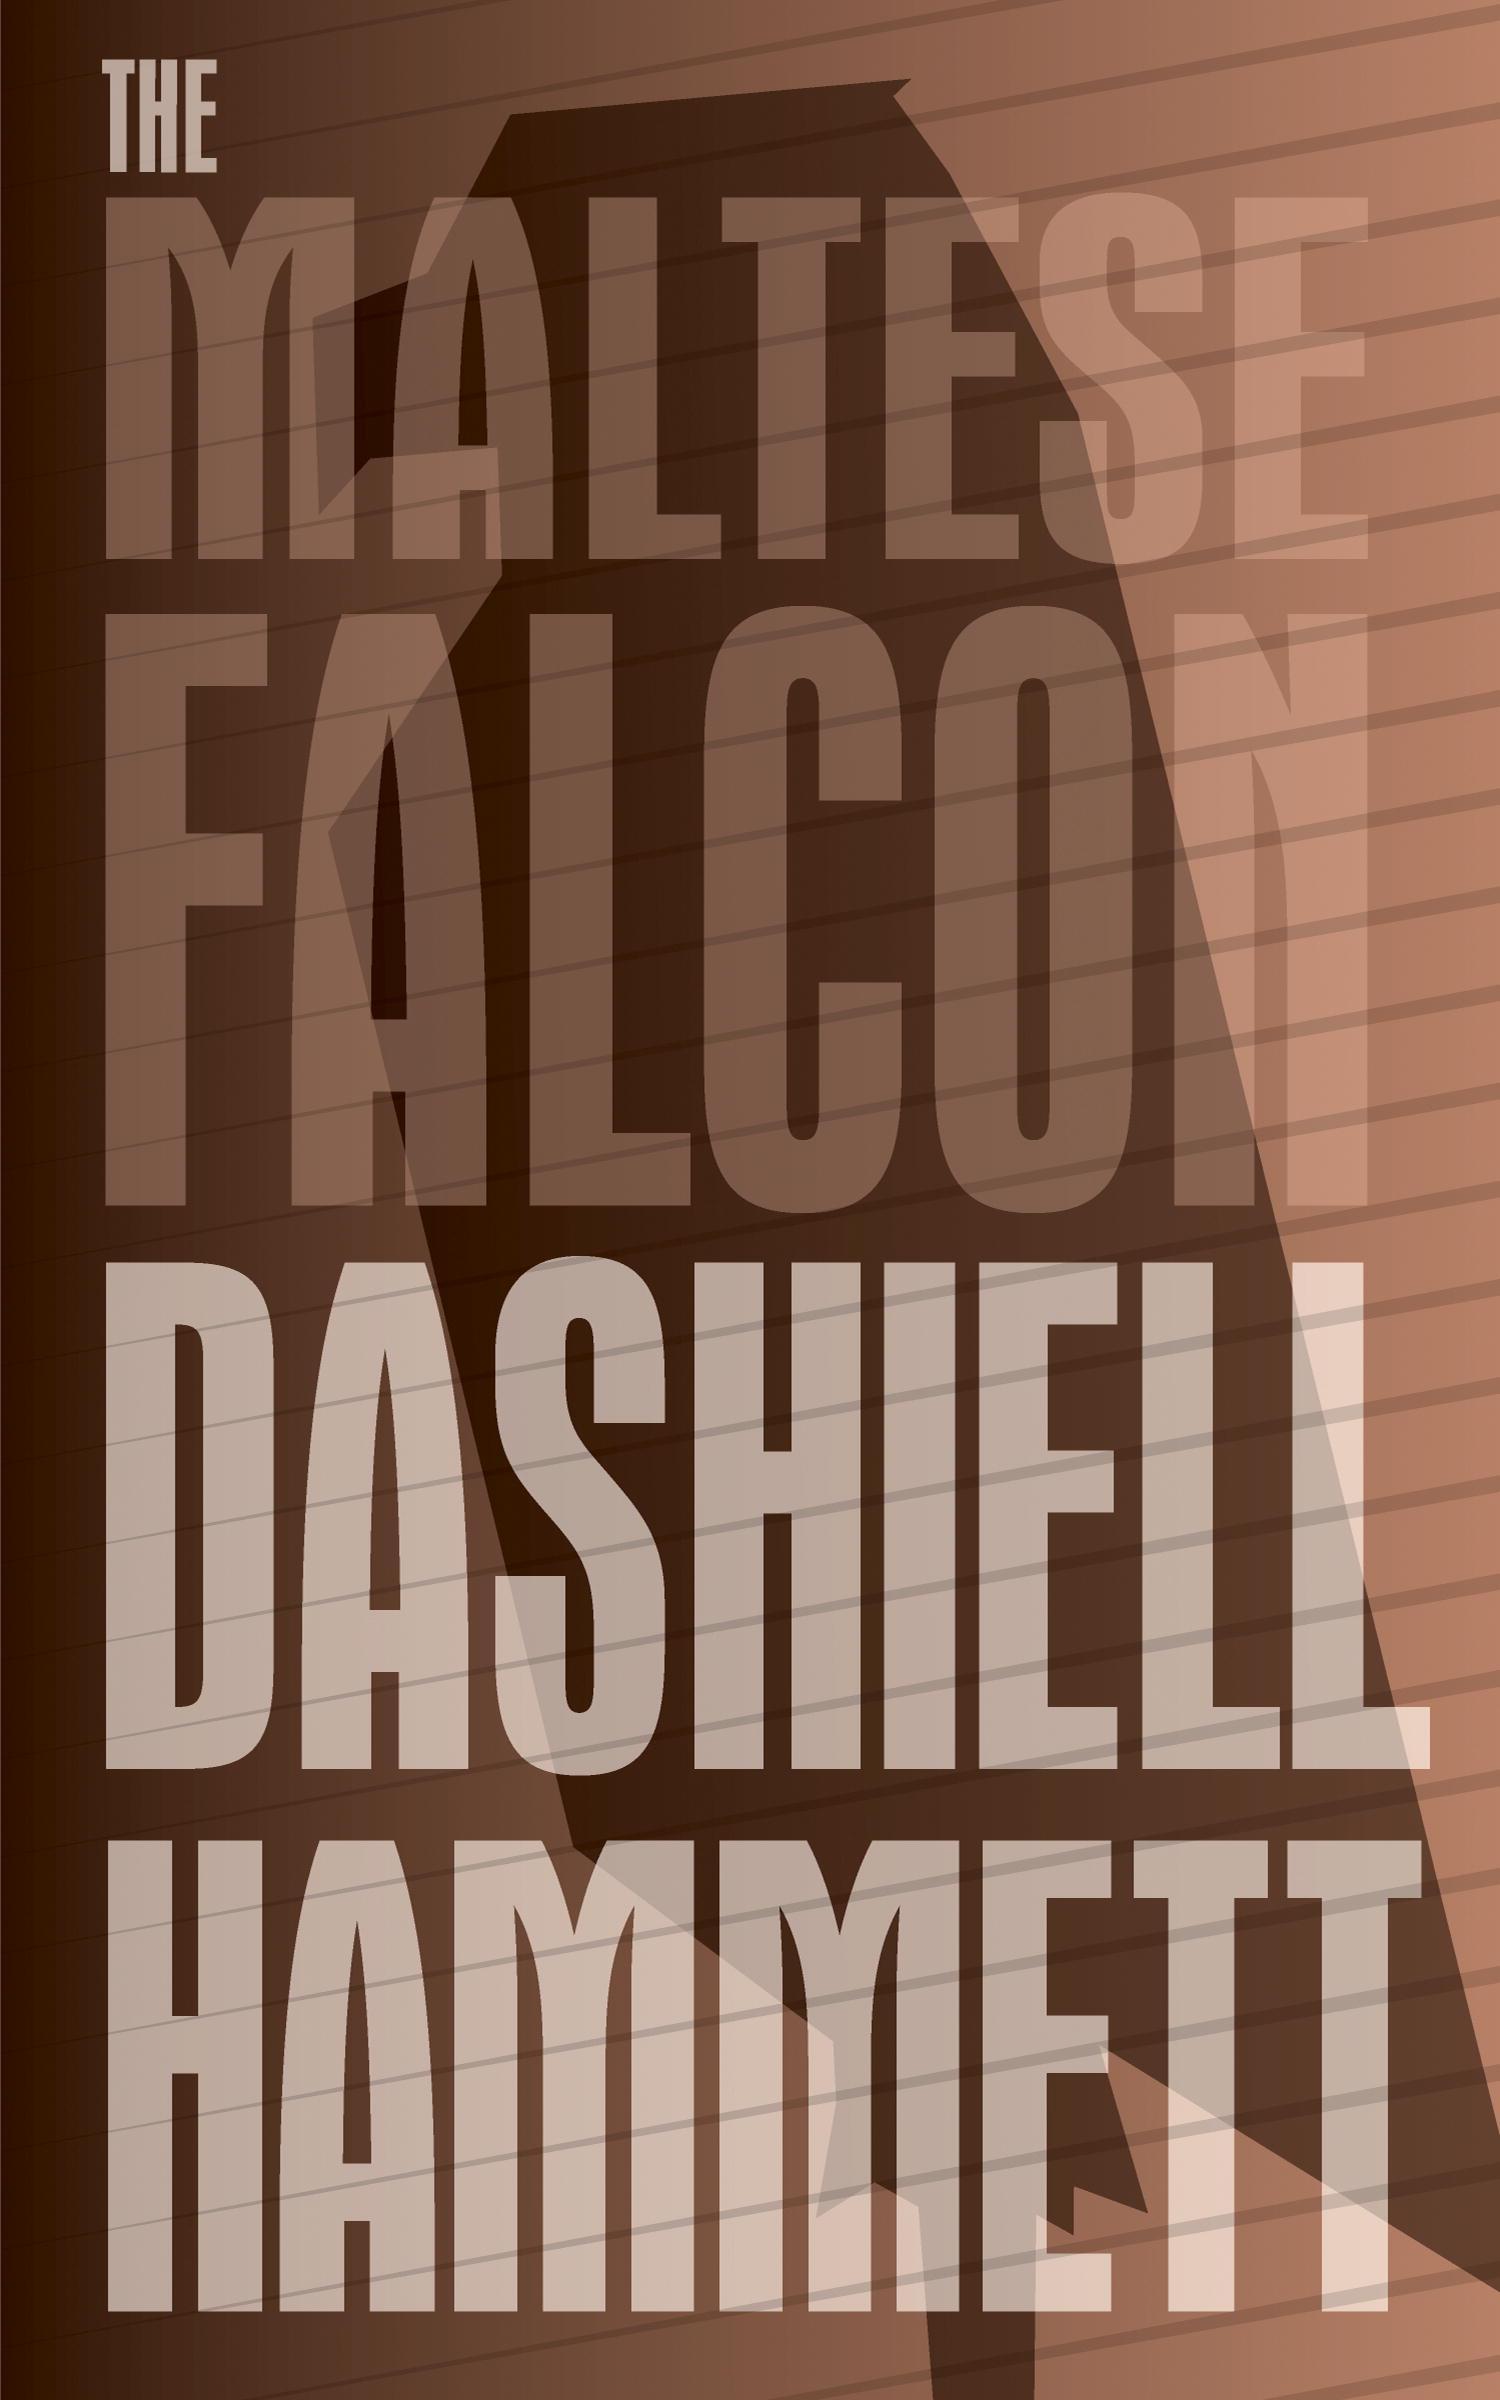 reading response to the maltese falcon